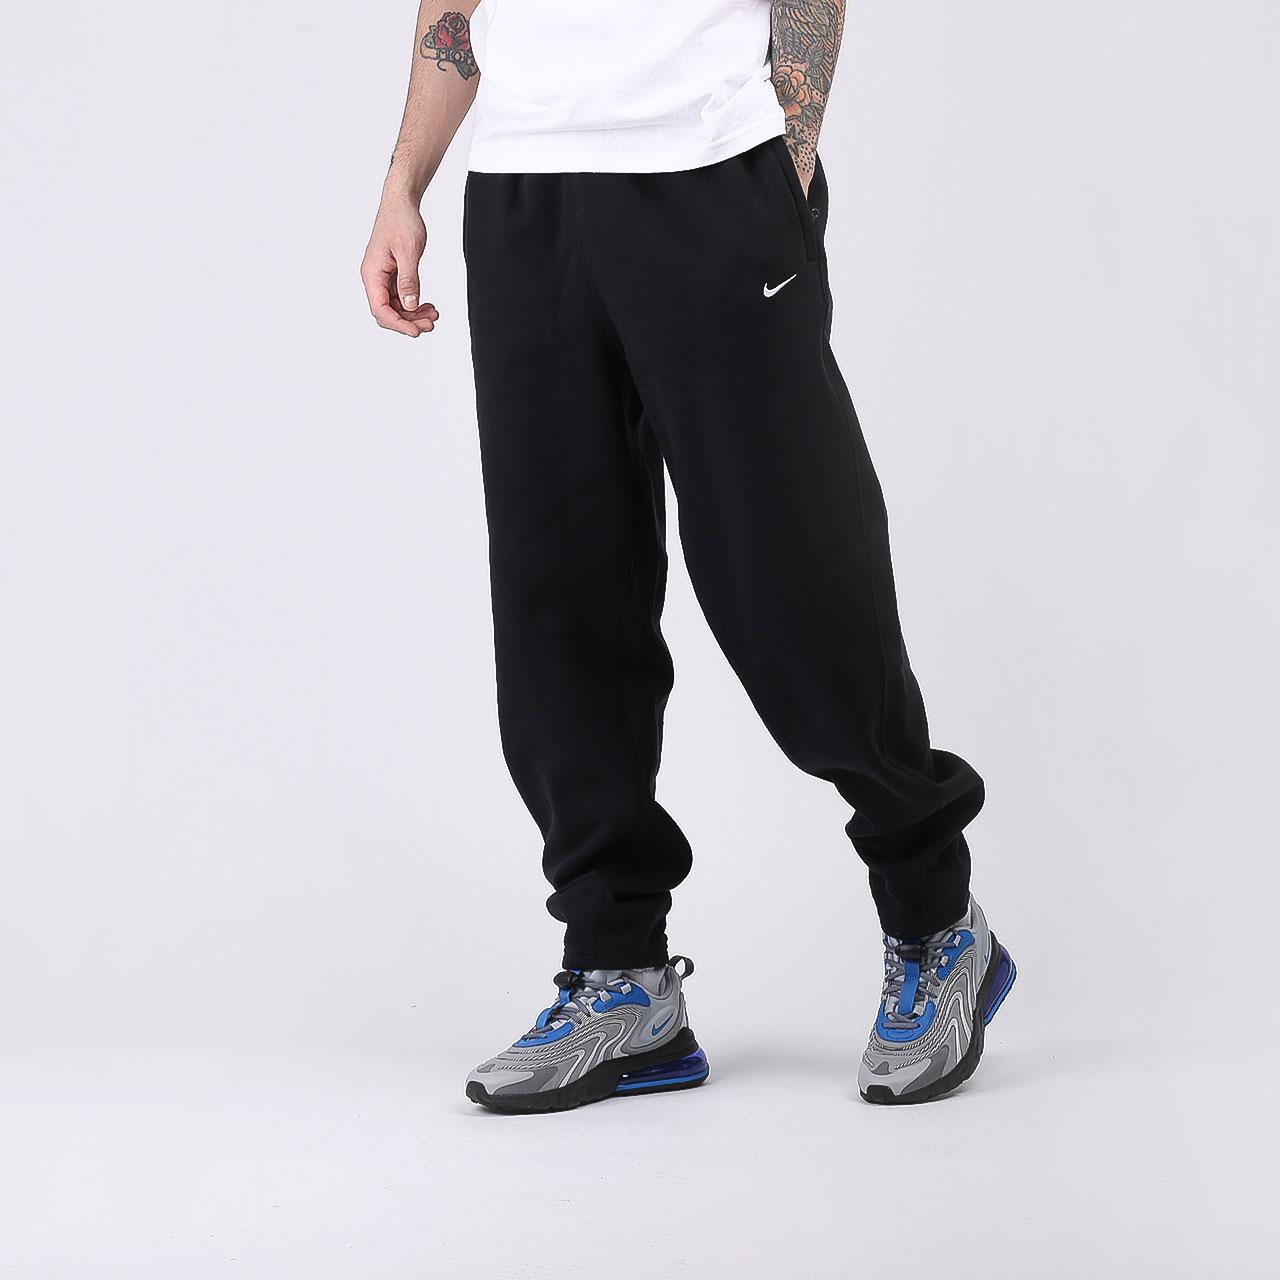 Брюки Nike NikeLab Men's Trousers фото